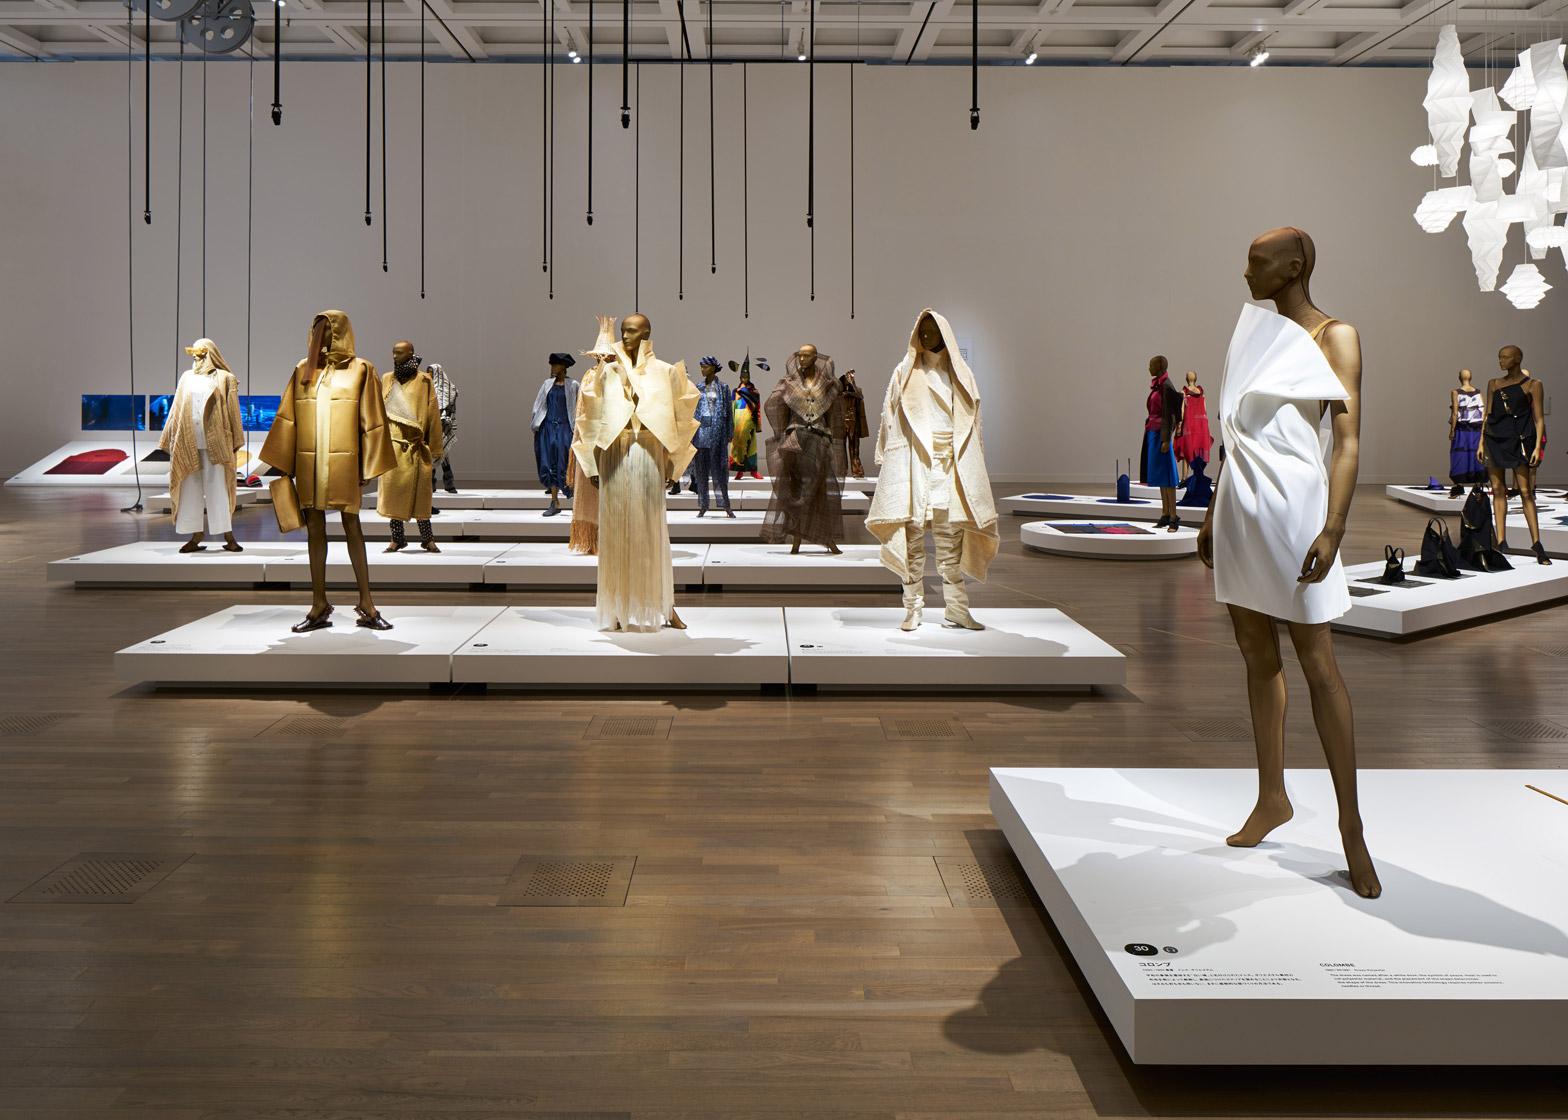 the-work-of-miyake-issey-exhibition-the-national-art-centre-tokyo_dezeen_1568_9.jpg